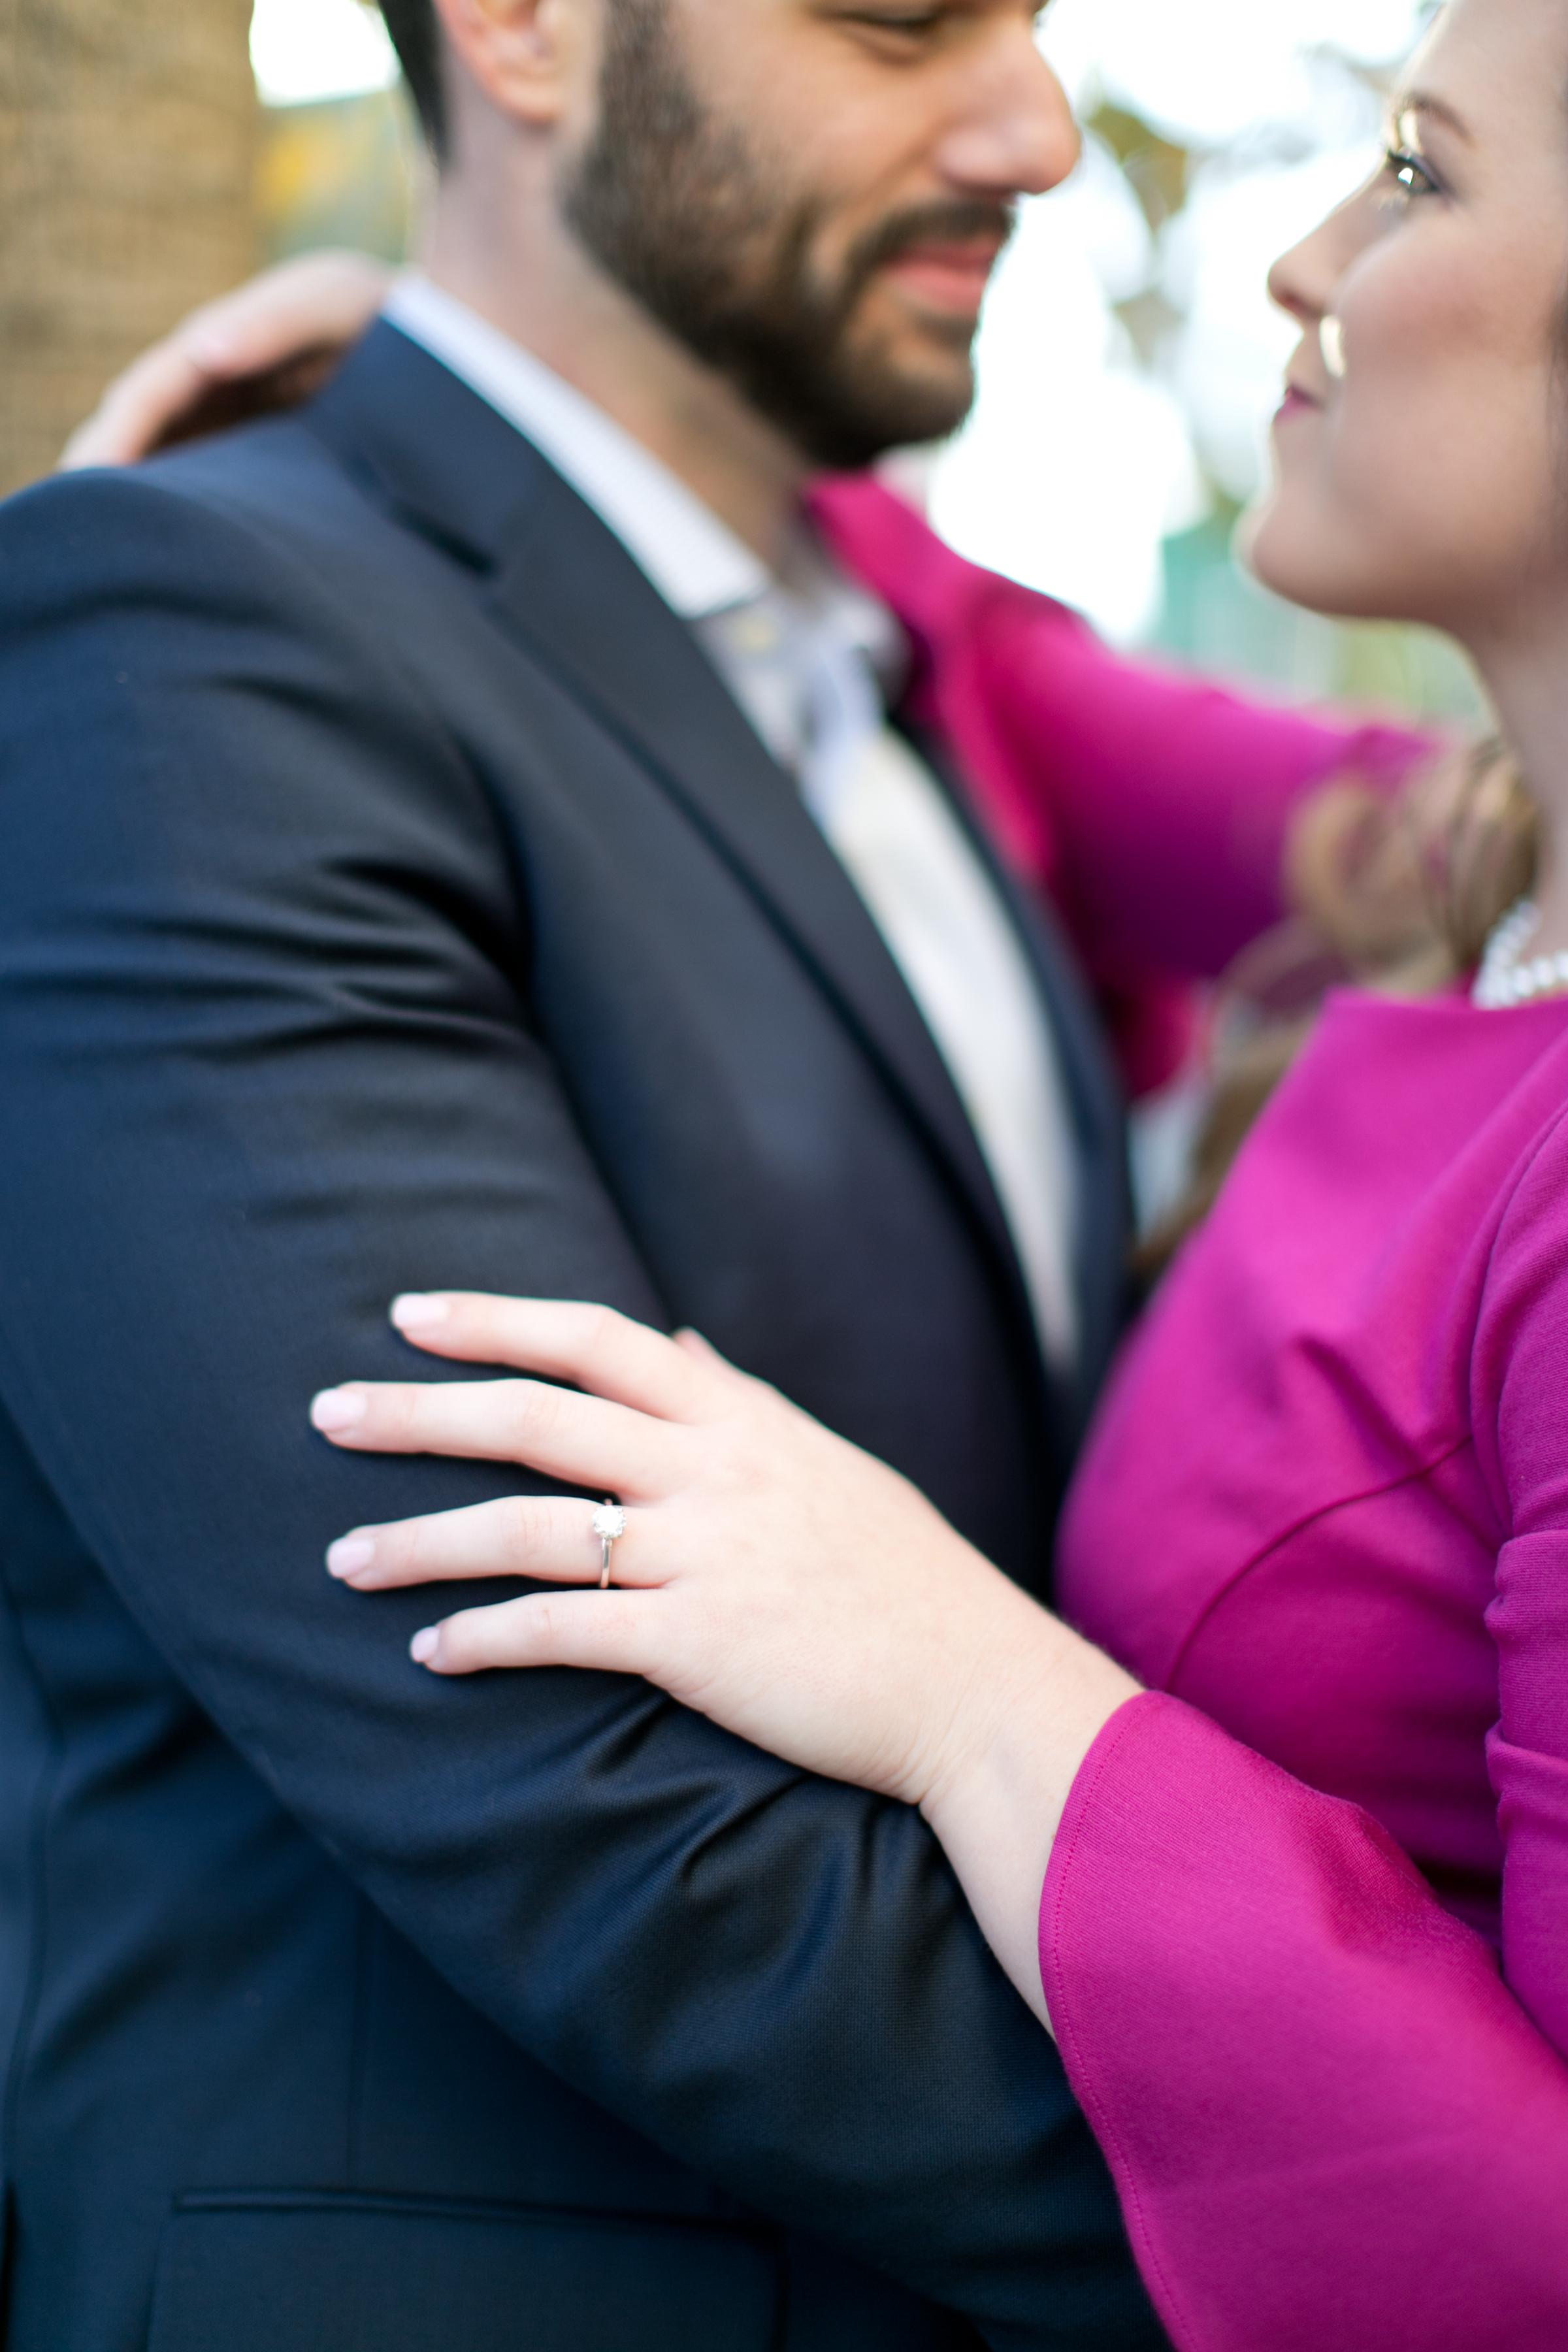 charleston_wedding_photographer05.jpg